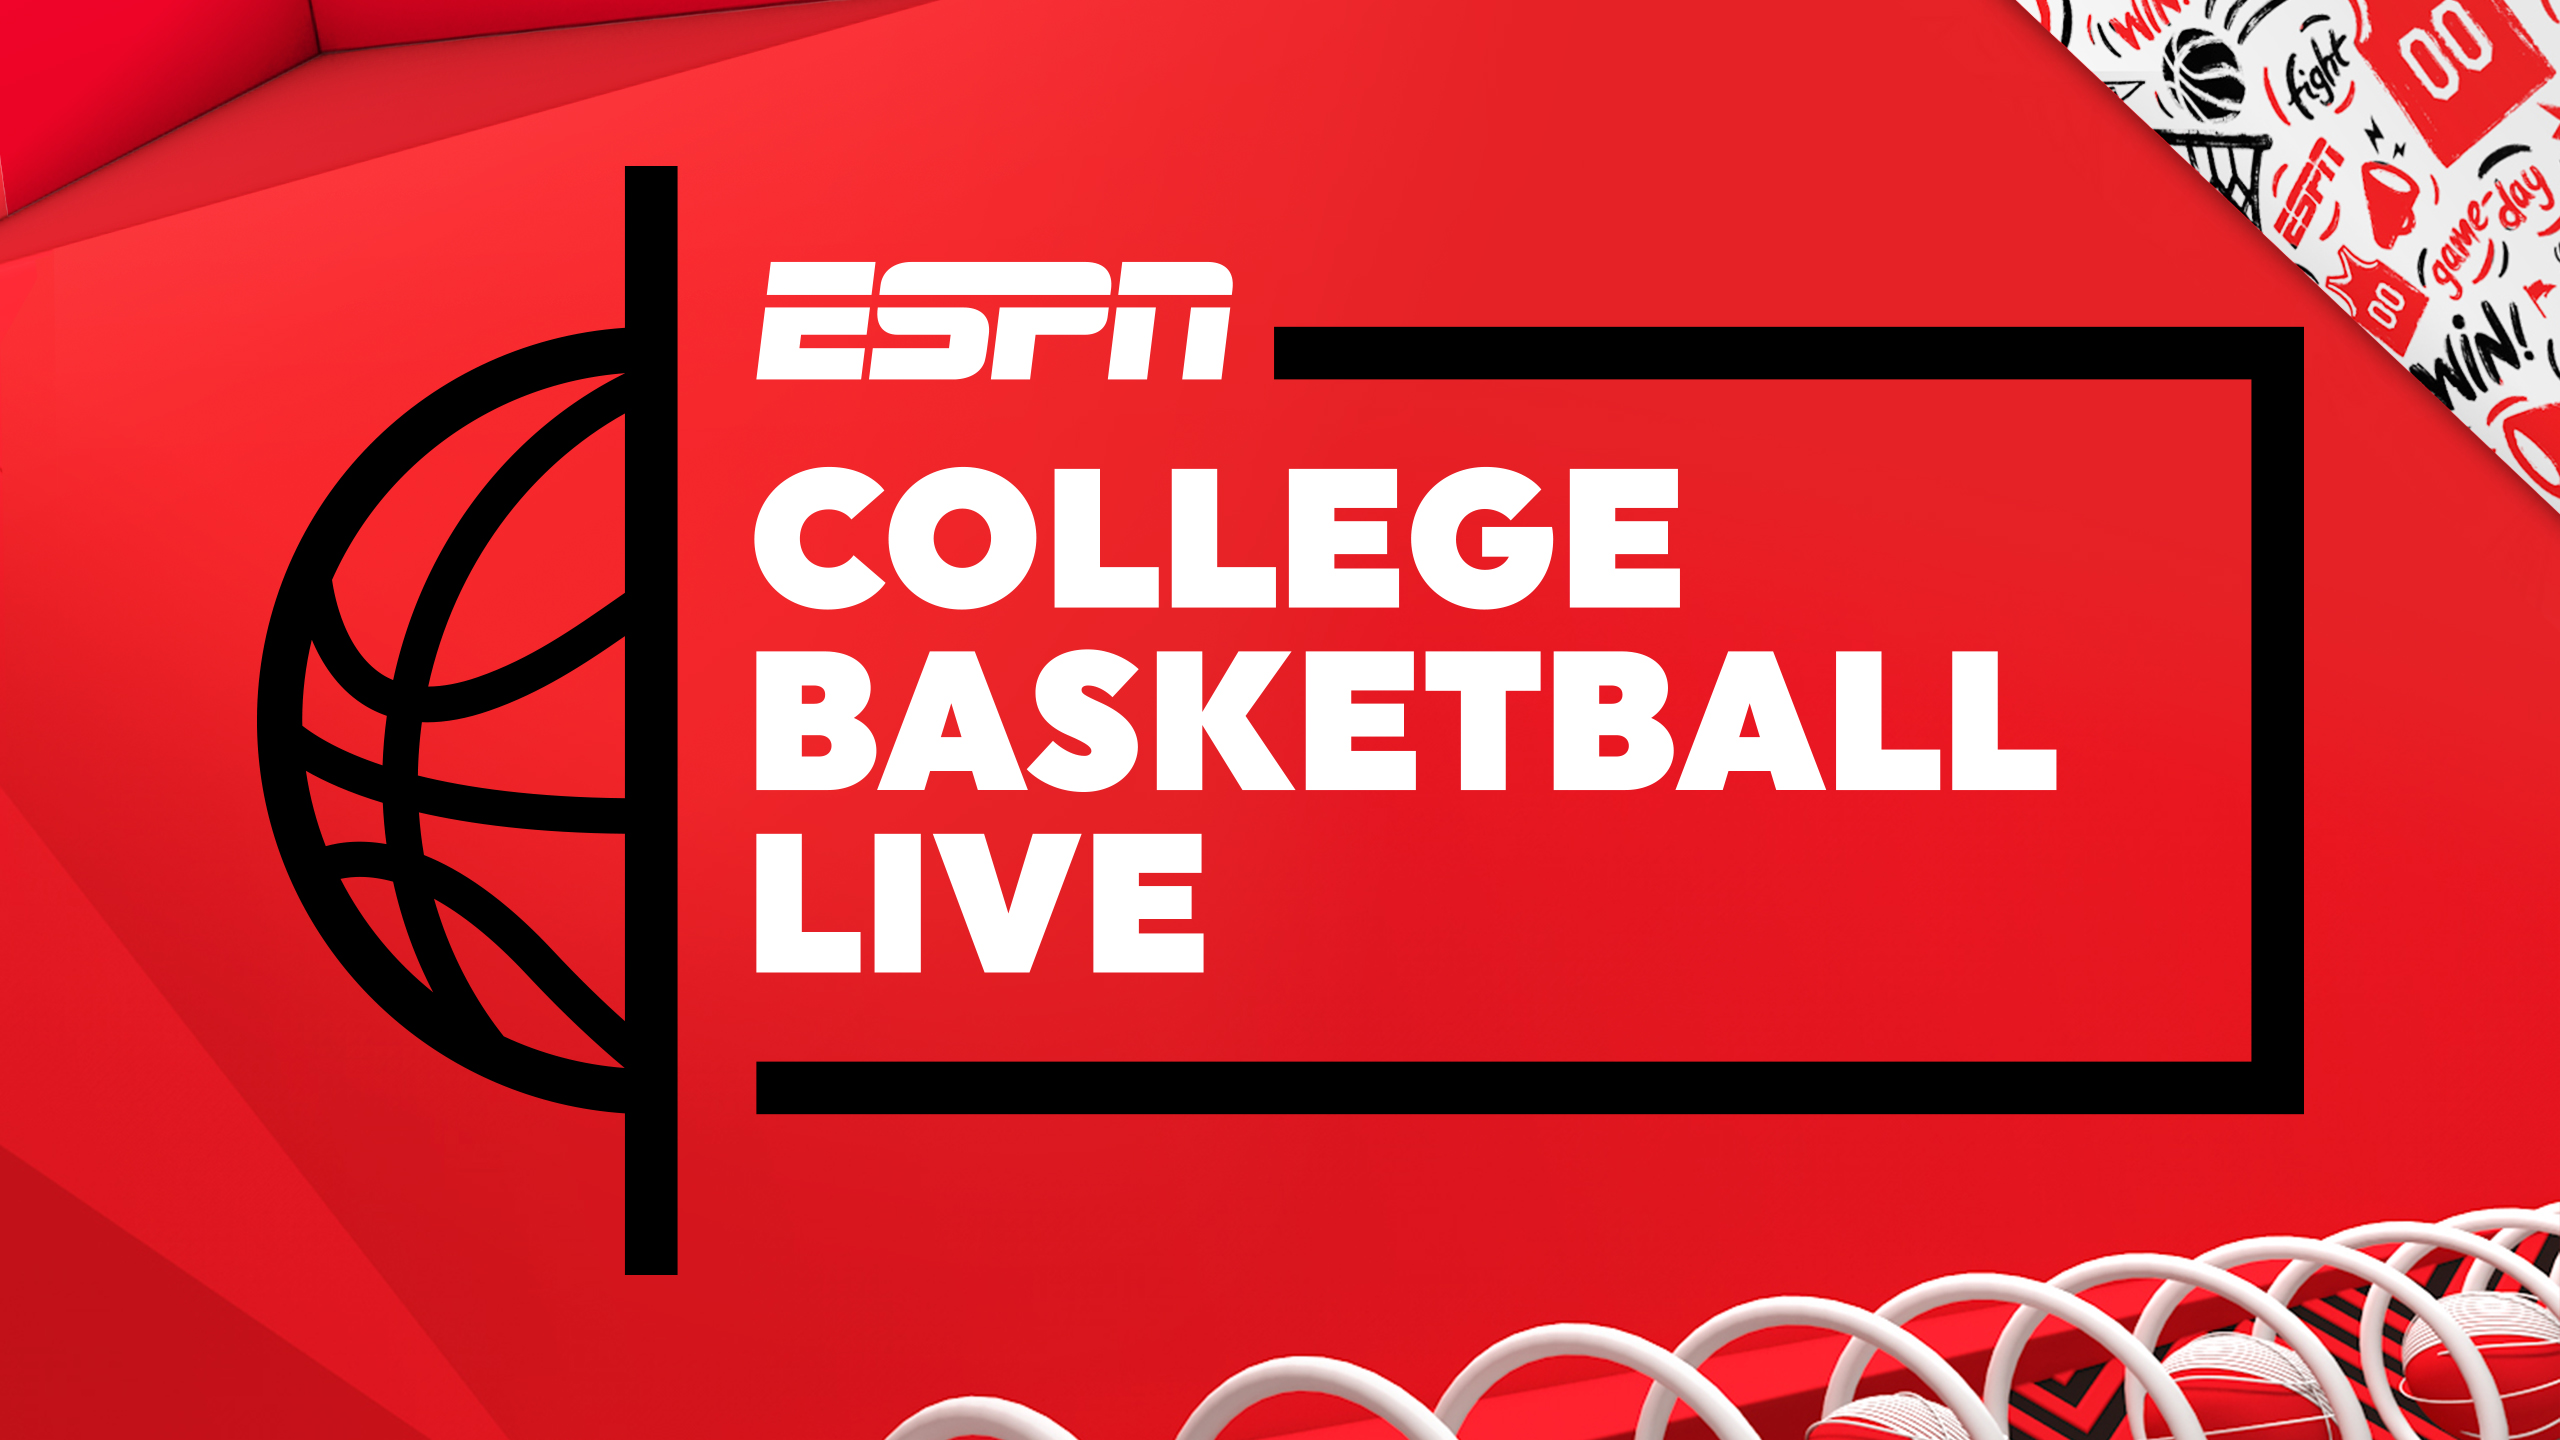 College Basketball Live Scoreboard presented by ZipRecruiter